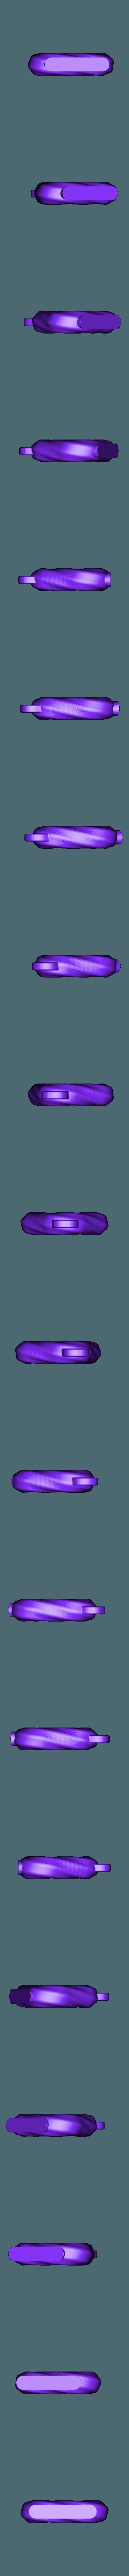 Trewi_keychain.STL Download free STL file trewi keychain • 3D printer template, Nedis